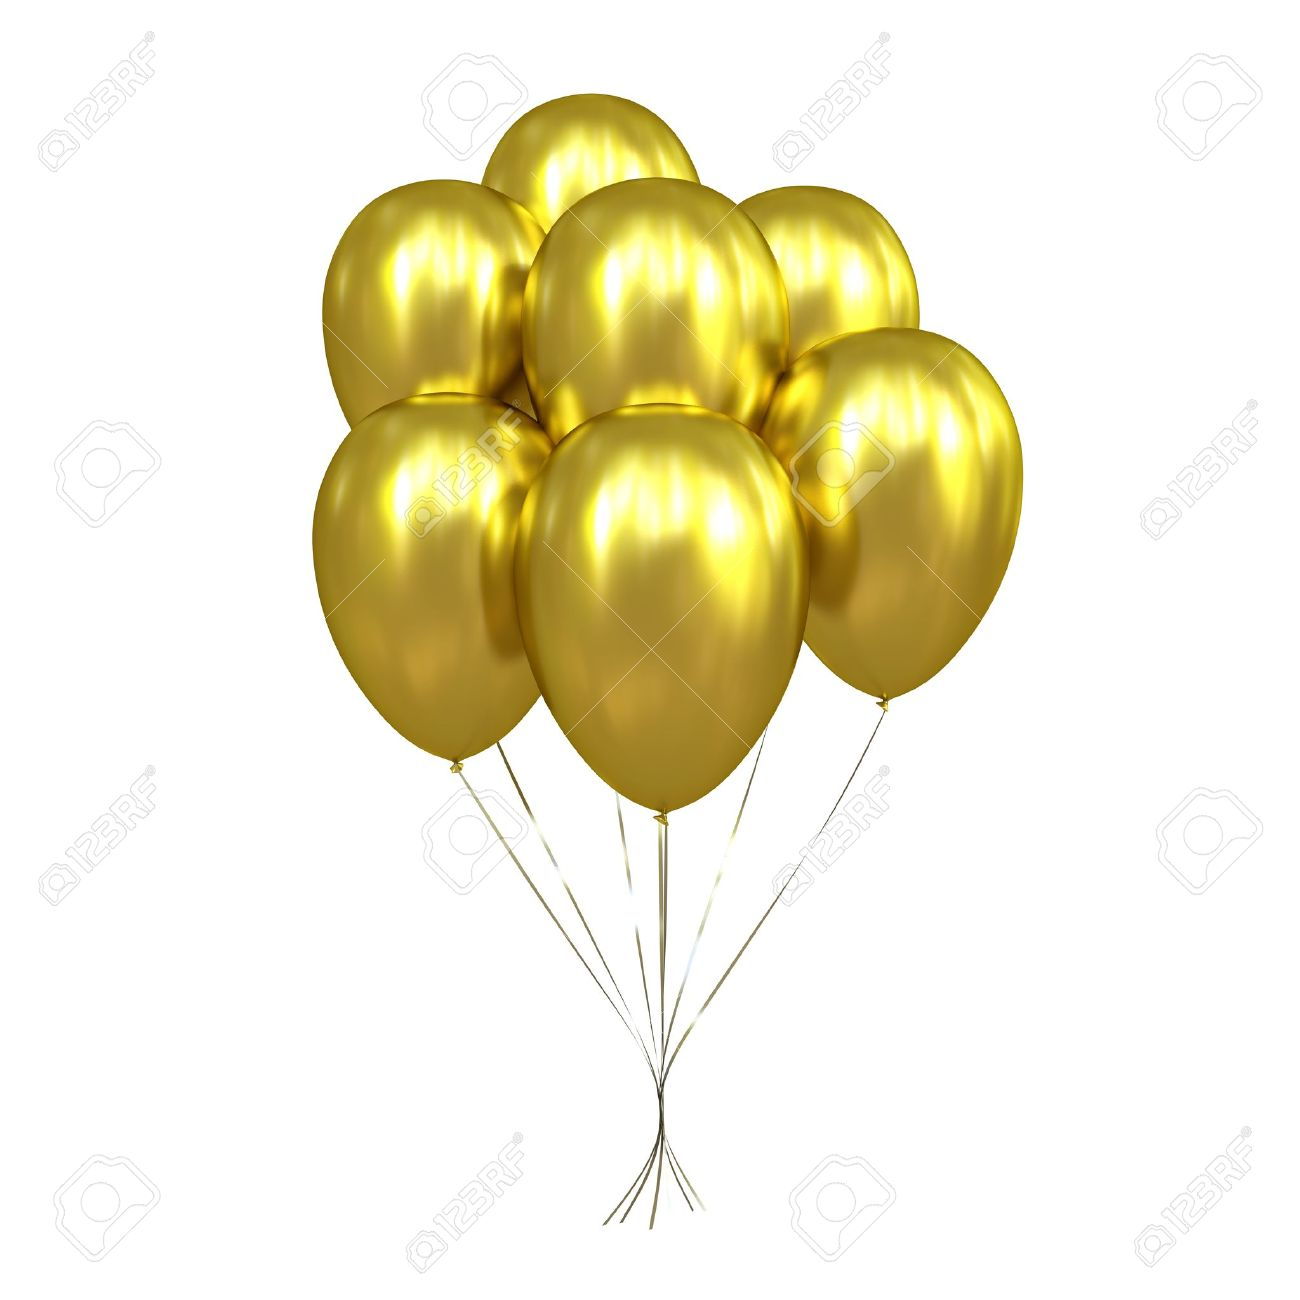 7 Golden Balloons Stock Photo - 21580749